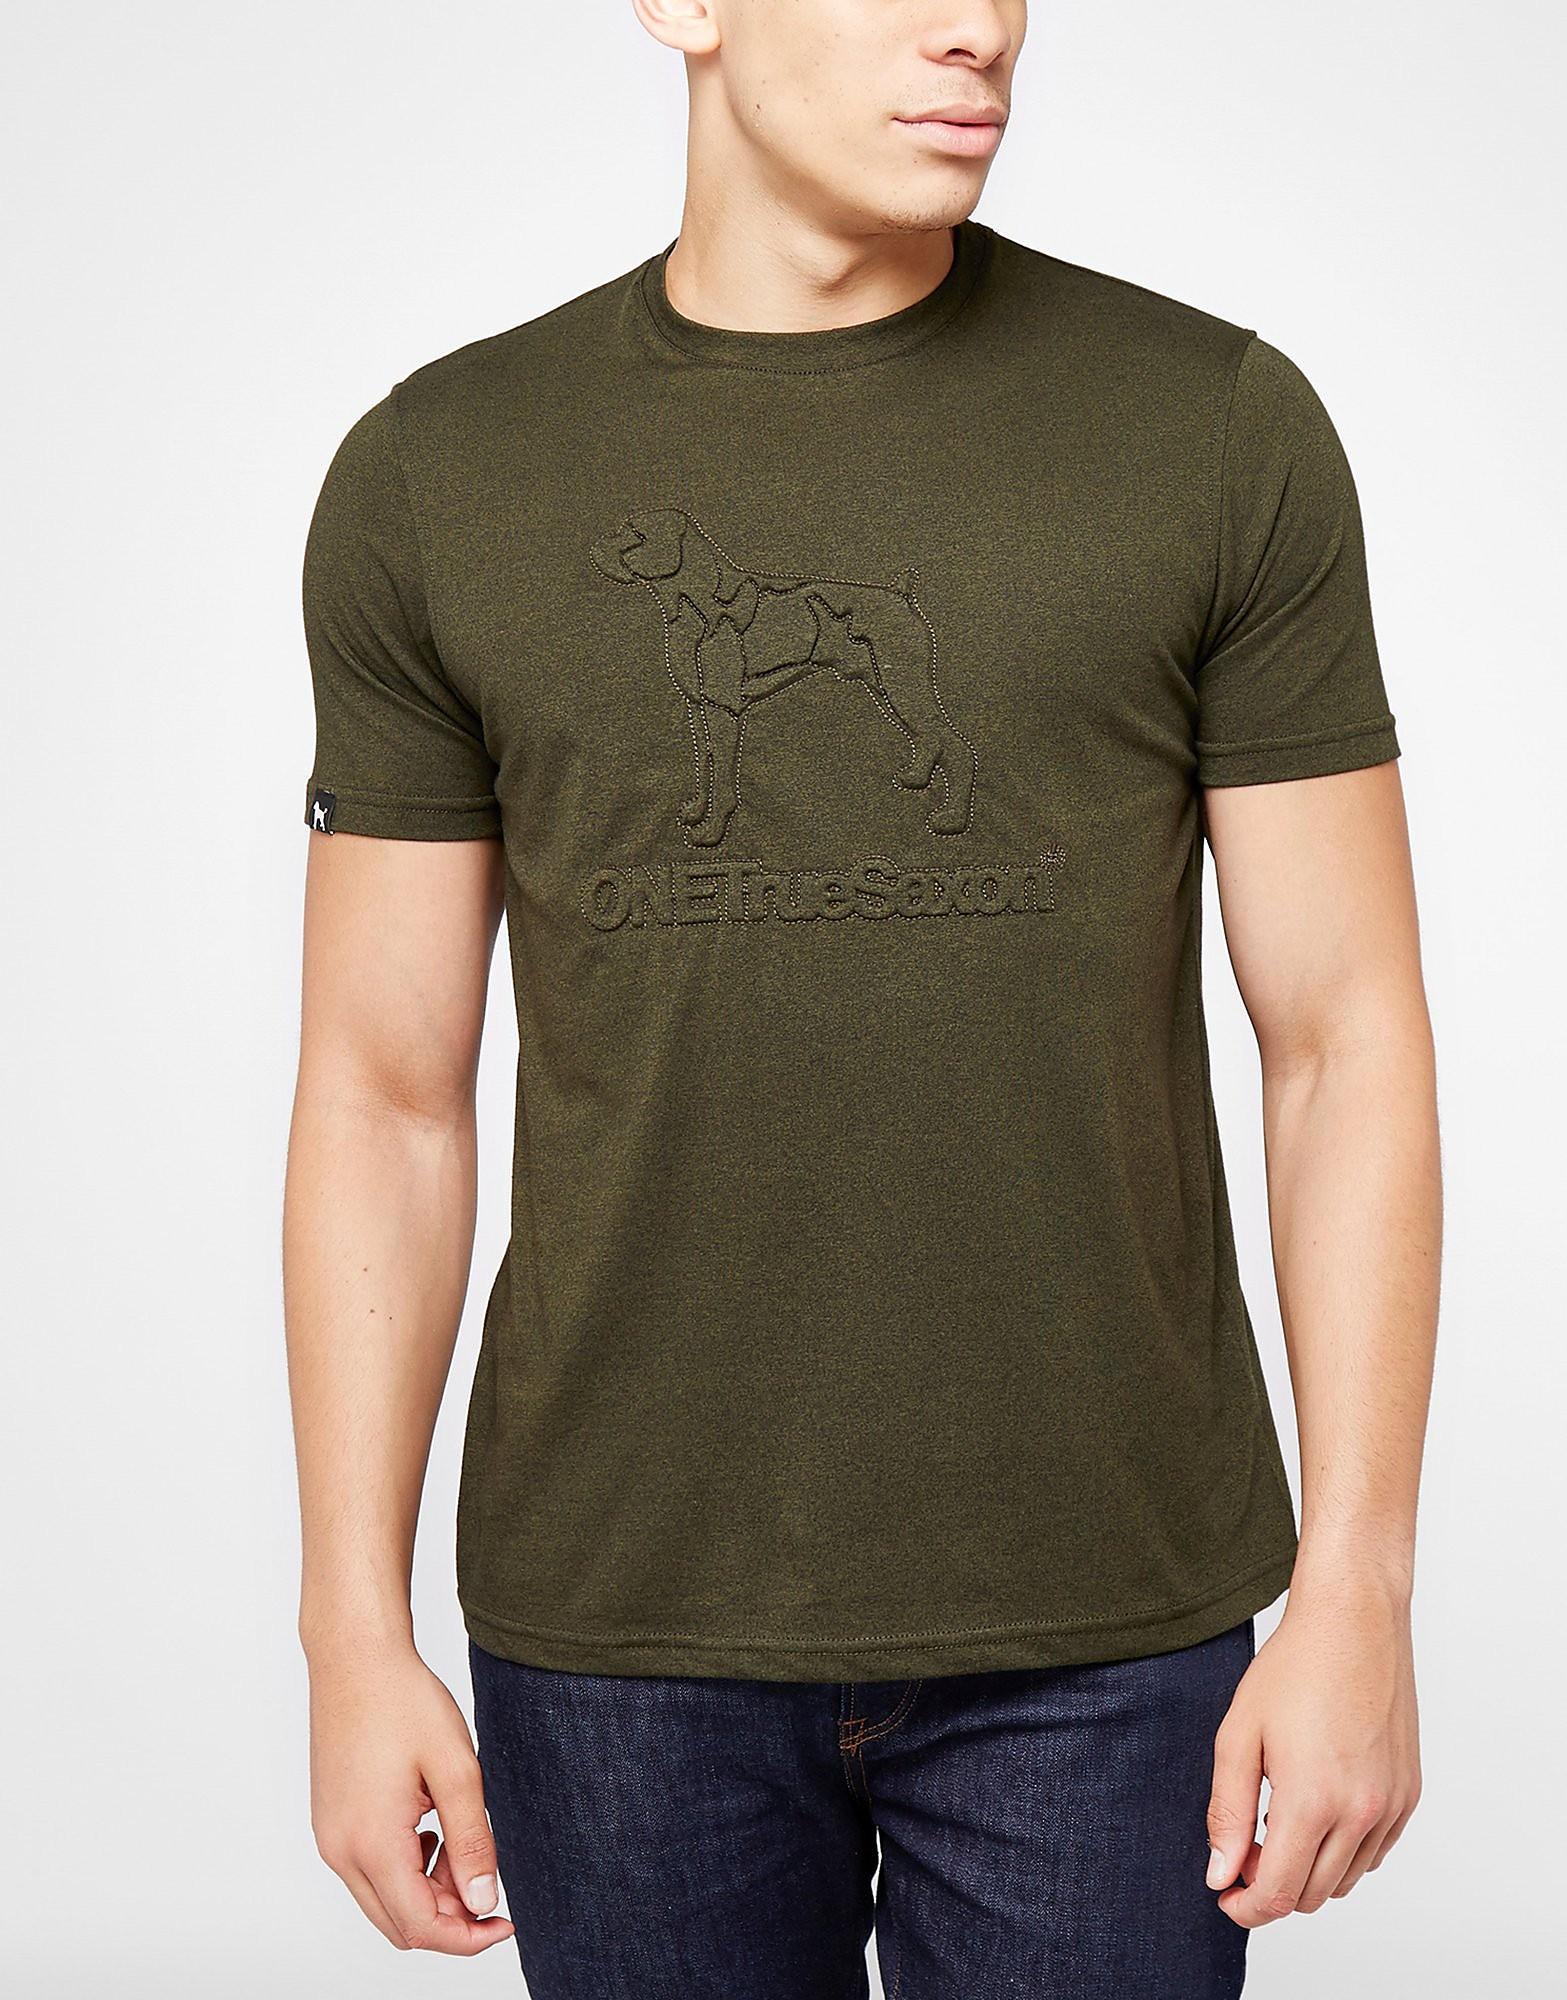 One True Saxon Rufus T-Shirt - Exclusive